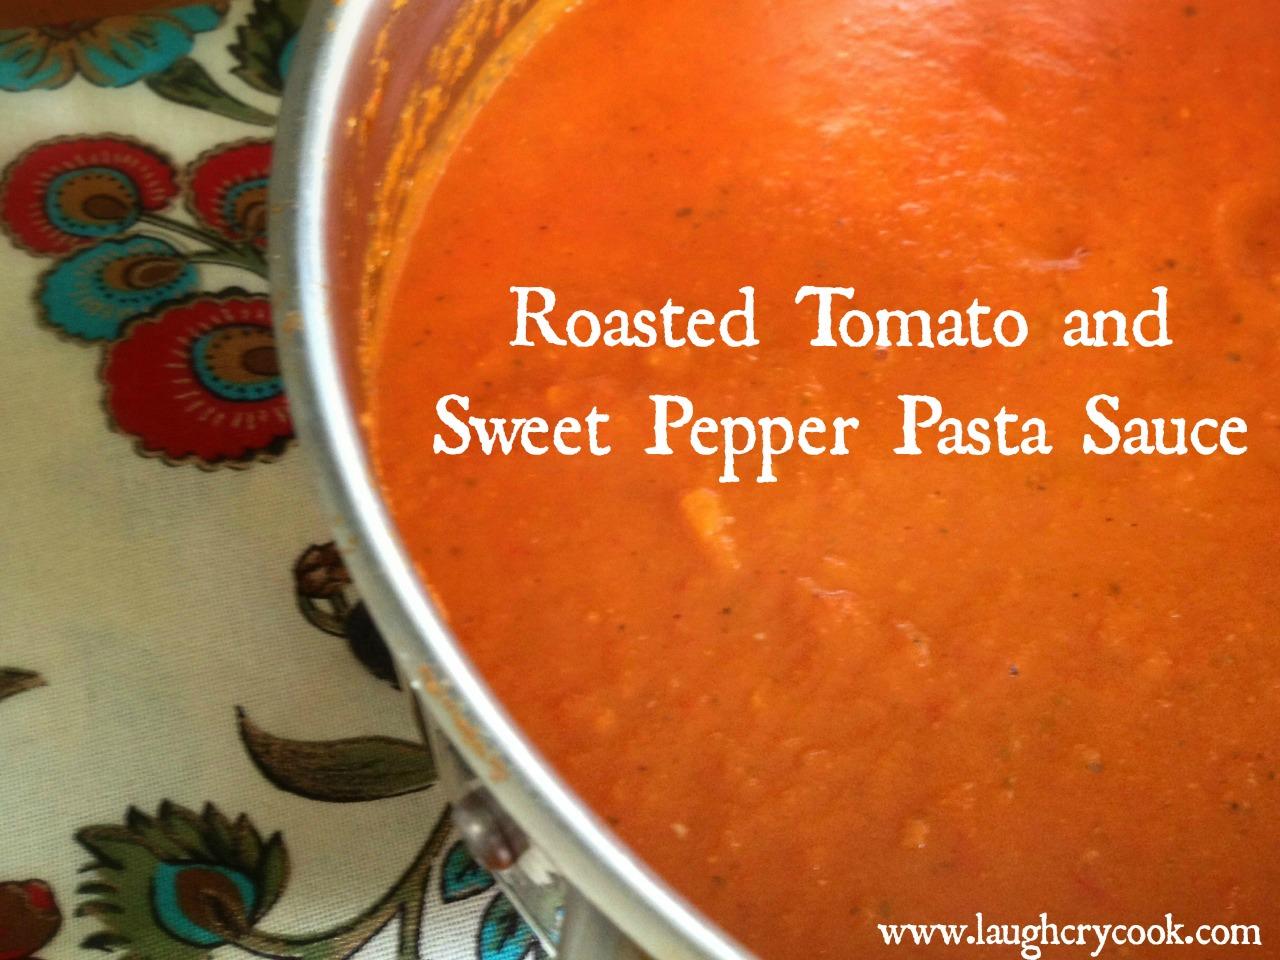 Becky Johnson's Blog - Roasted Tomato and Sweet Pepper ...